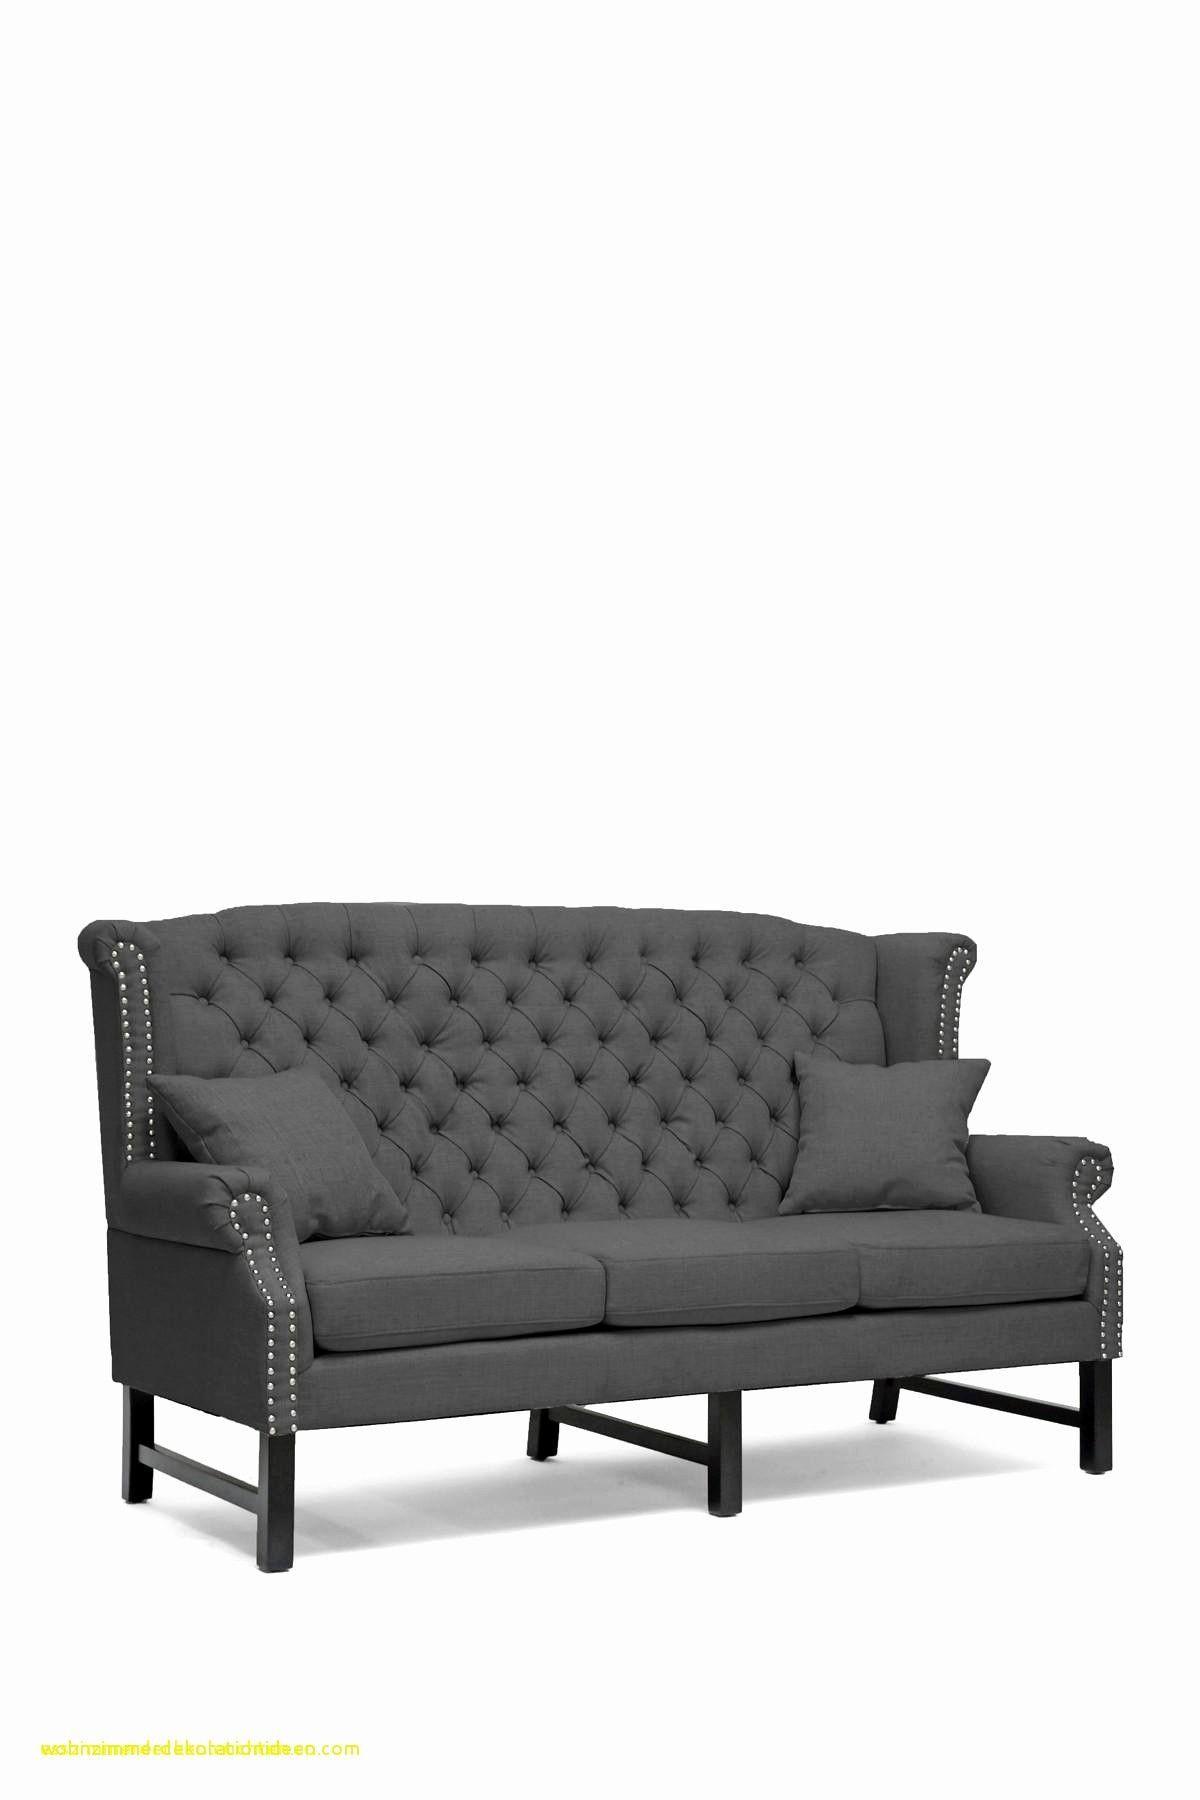 21 Einzigartige Mikrofaser Futon Sofa Sofa Sofa Bed Sale Ikea Sofa Ikea Couch